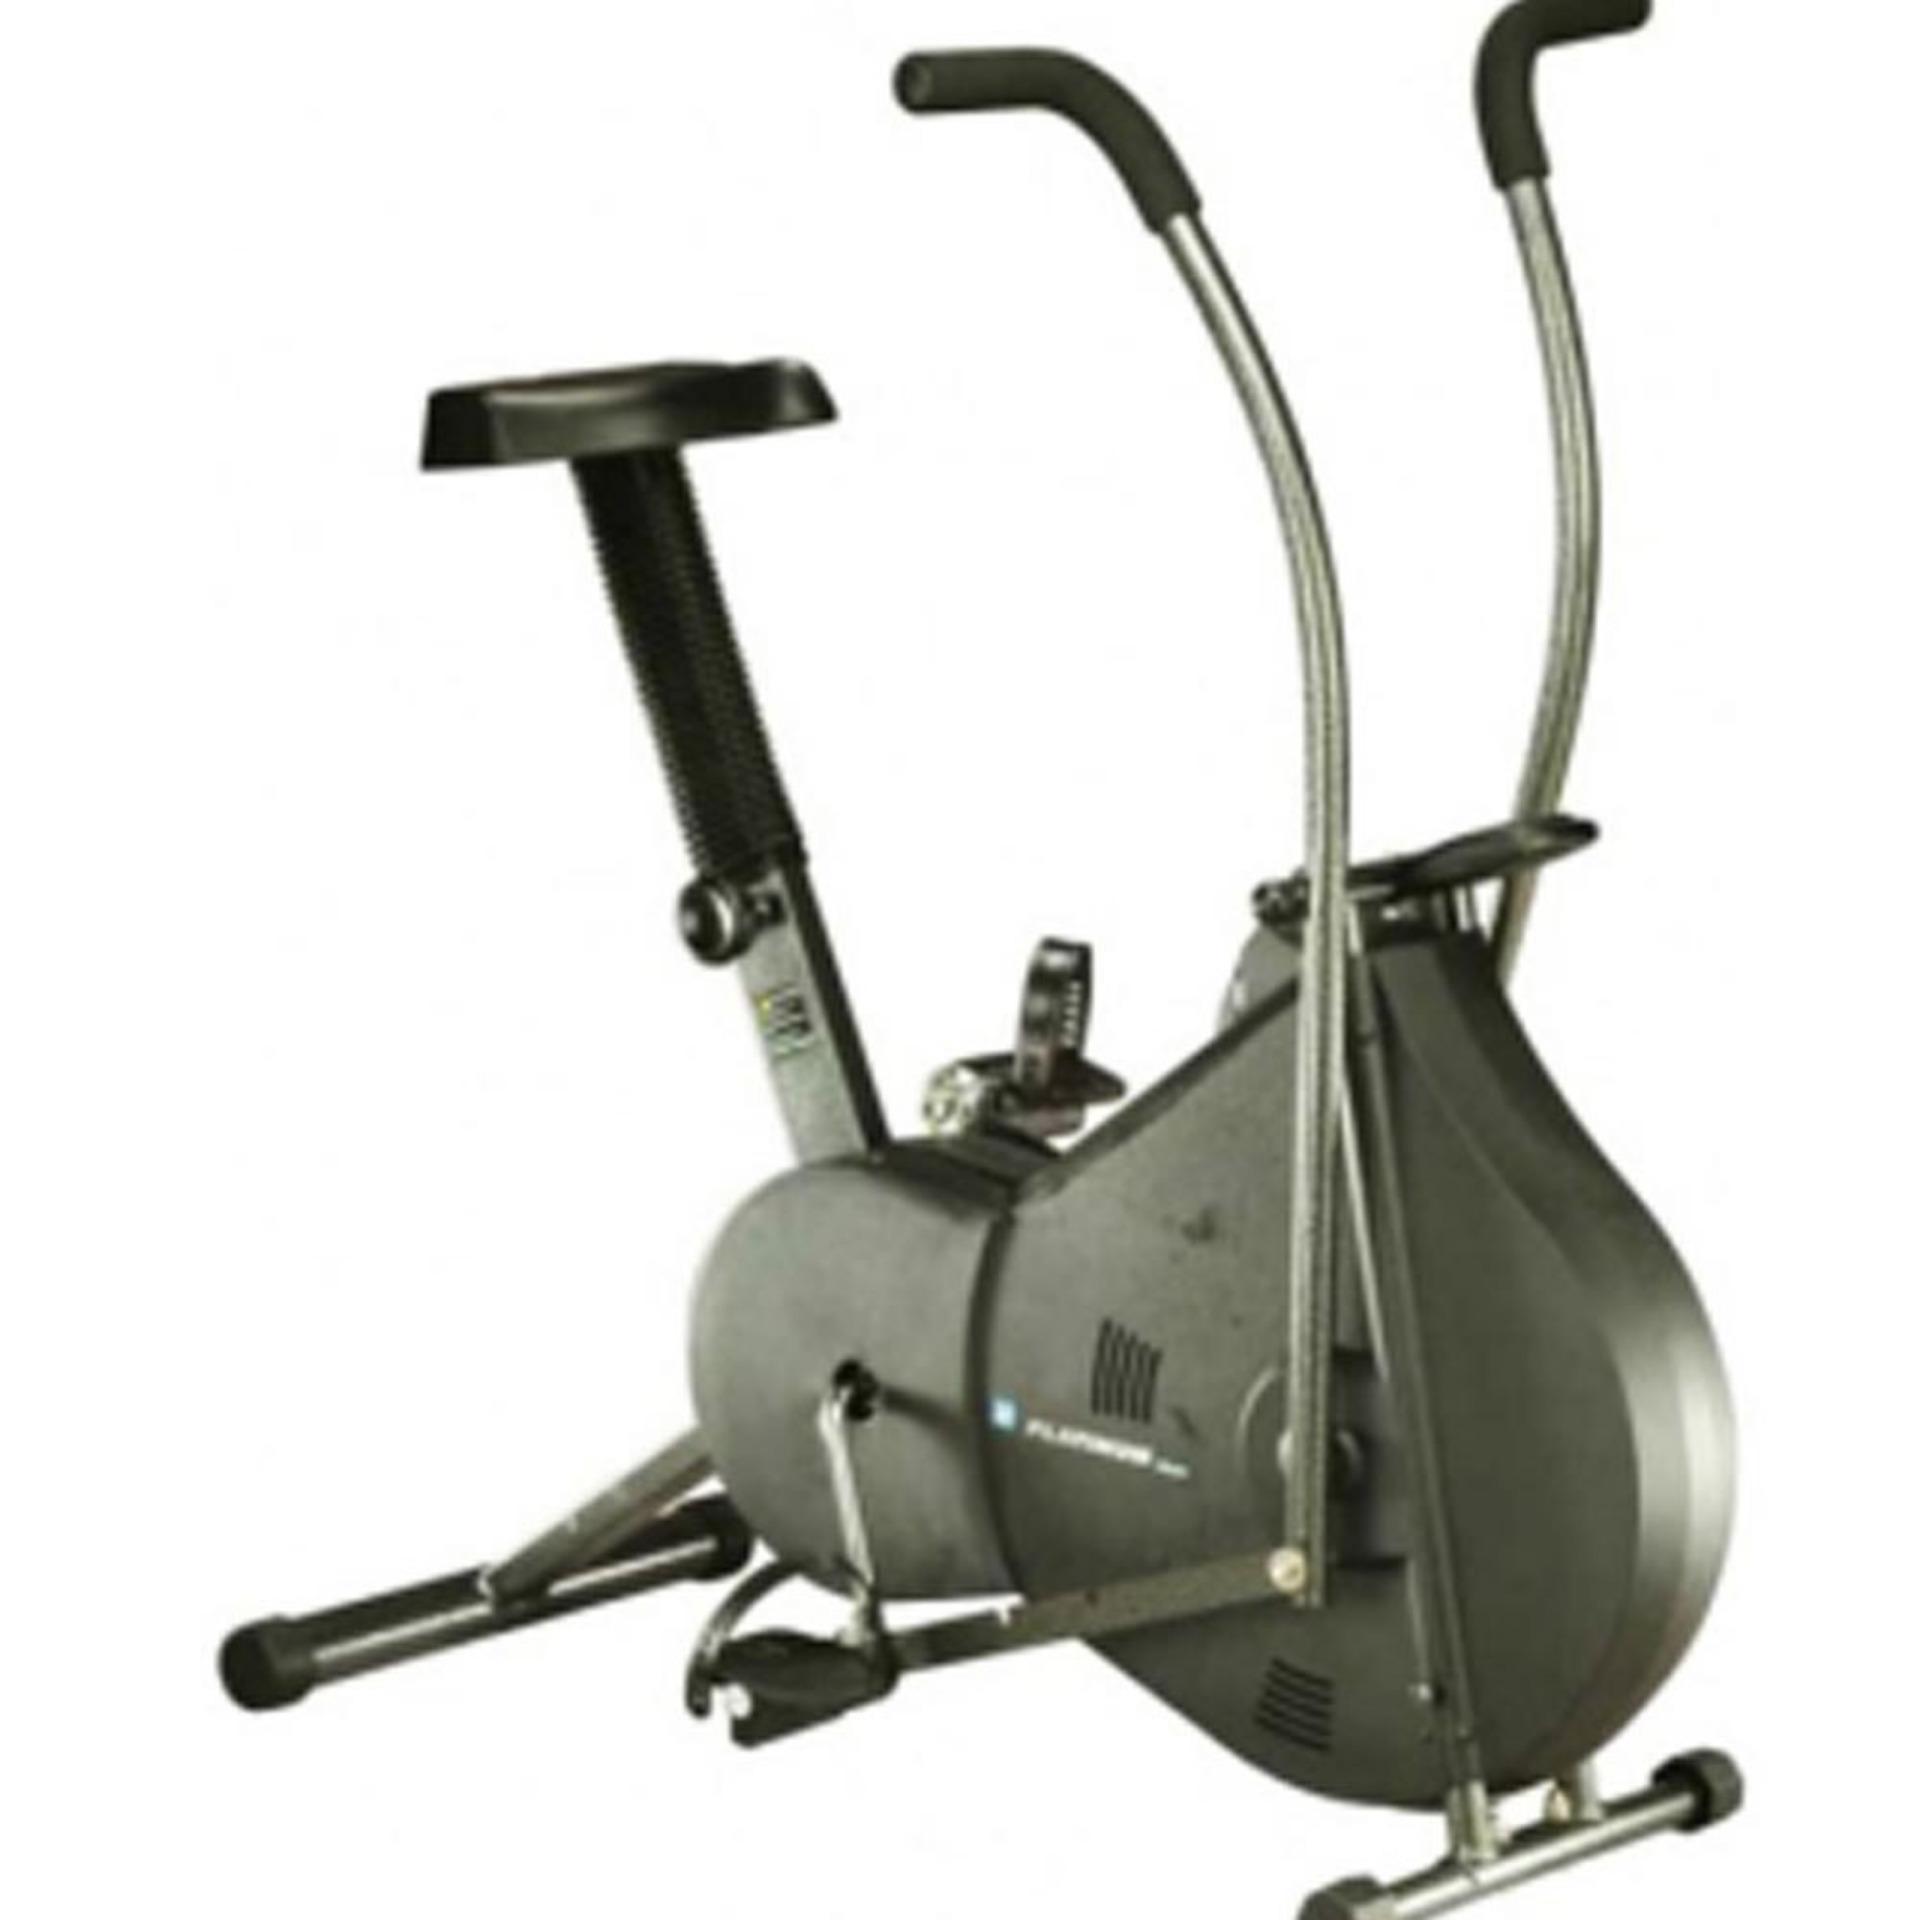 Total Fitness Spinning Bike Tl 930 Multicolor Sepeda Statis Orbitrack Multifungsi Orb2000s Sangat Nyaman Dan Aman Wind Cycle With Full Cover Handle Tl8202